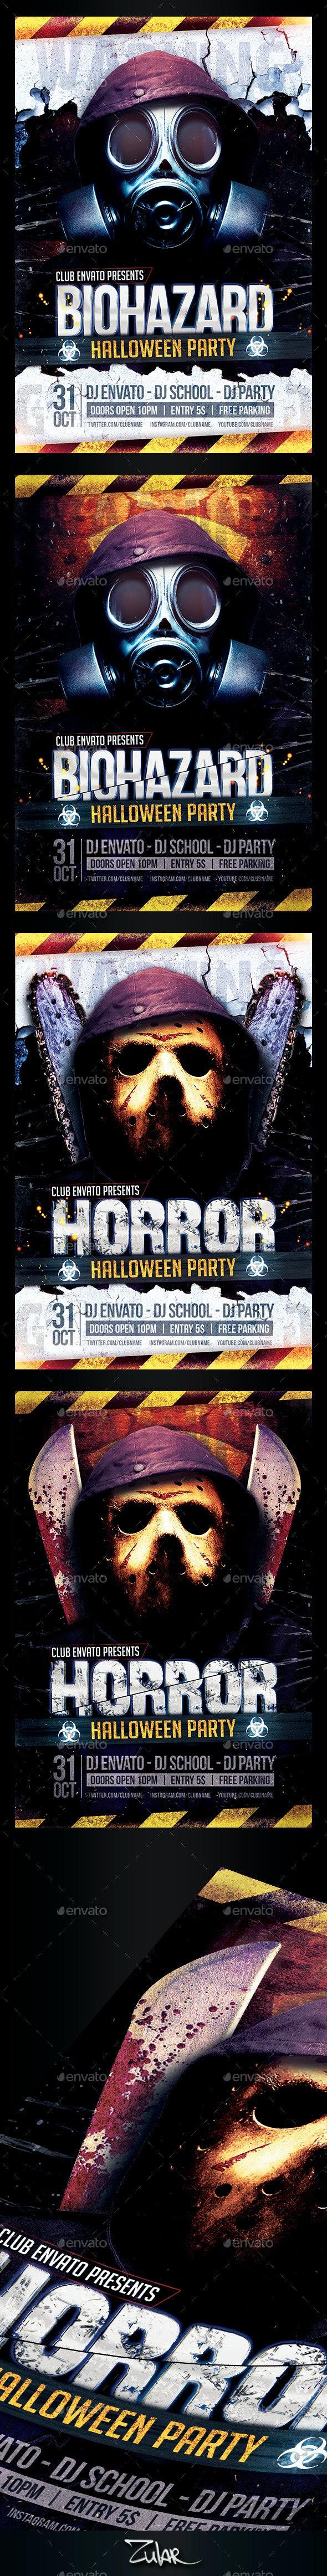 Horror & Biohazard Halloween Party Flyers - Events Flyers